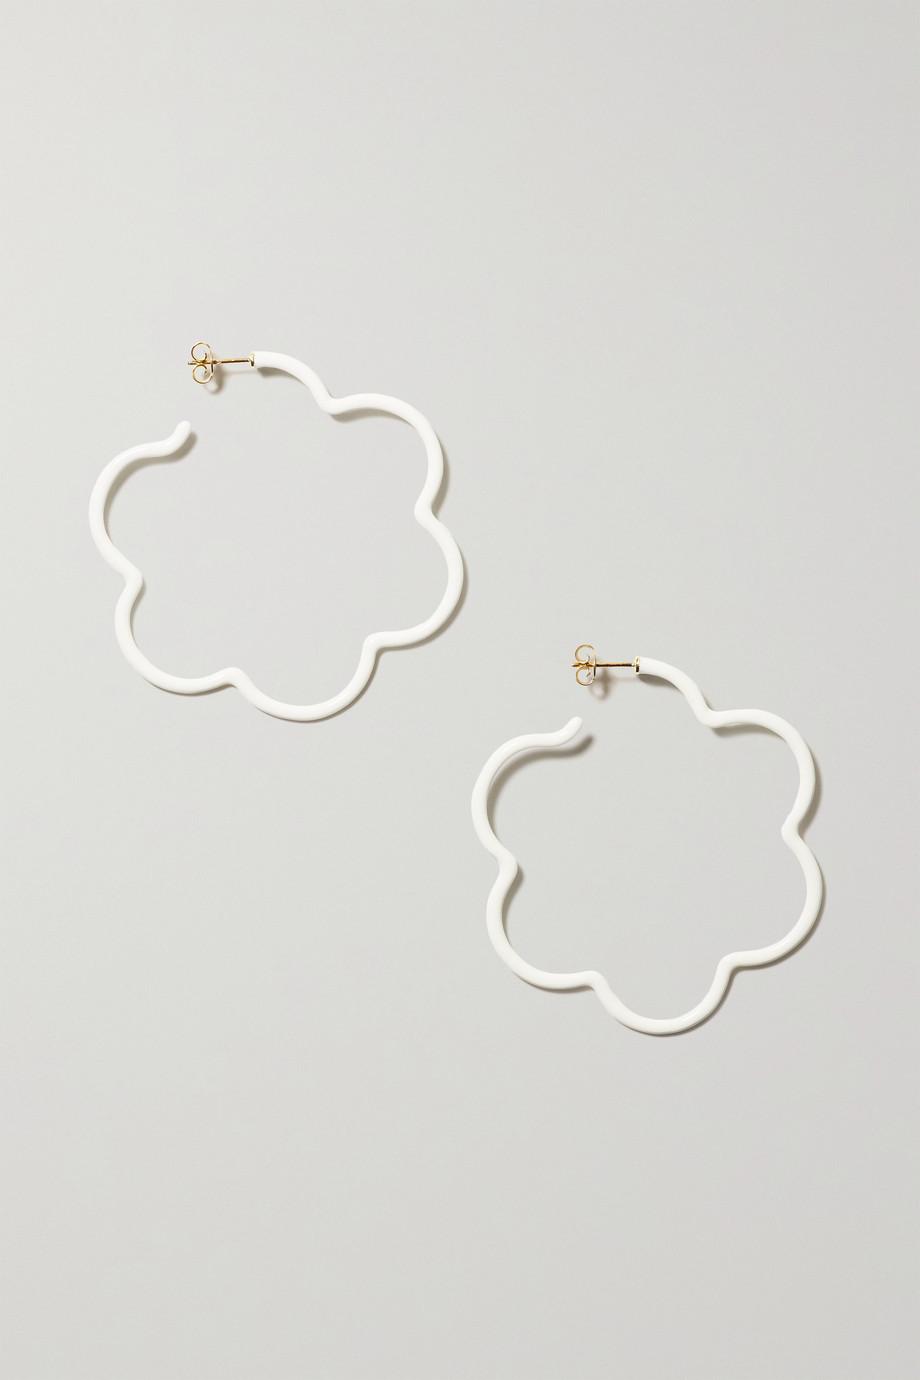 Bea Bongiasca Flower Power 9-karat gold, sterling silver and enamel earrings